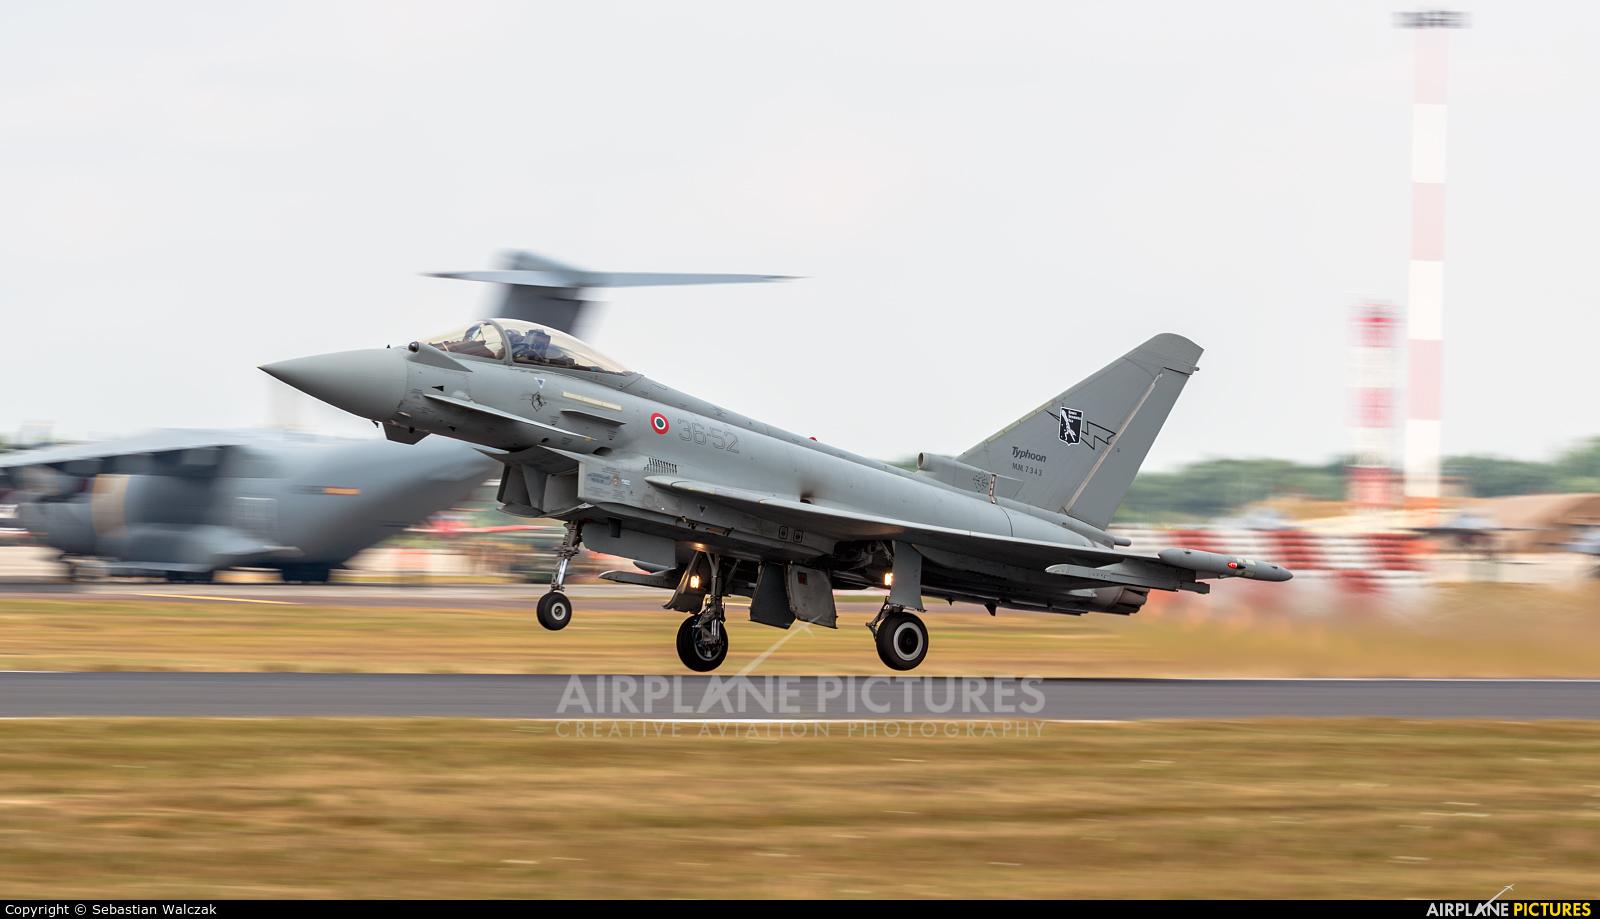 Italy - Air Force MM7343 aircraft at Fairford